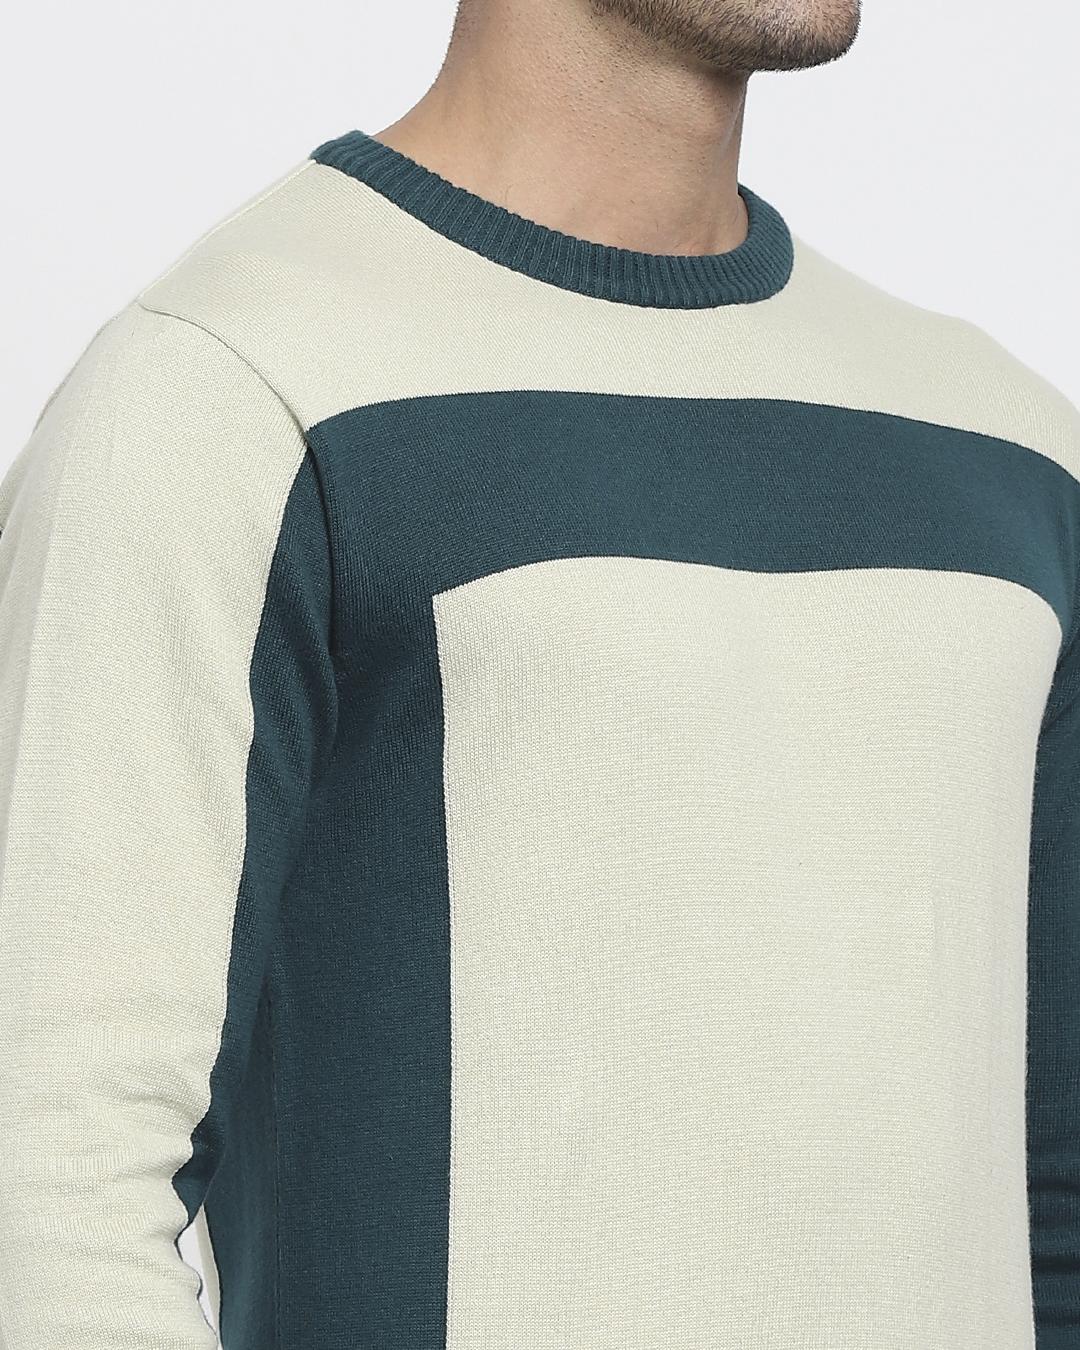 ShopAloe Wash Color Block Flat Knit Sweater-Full